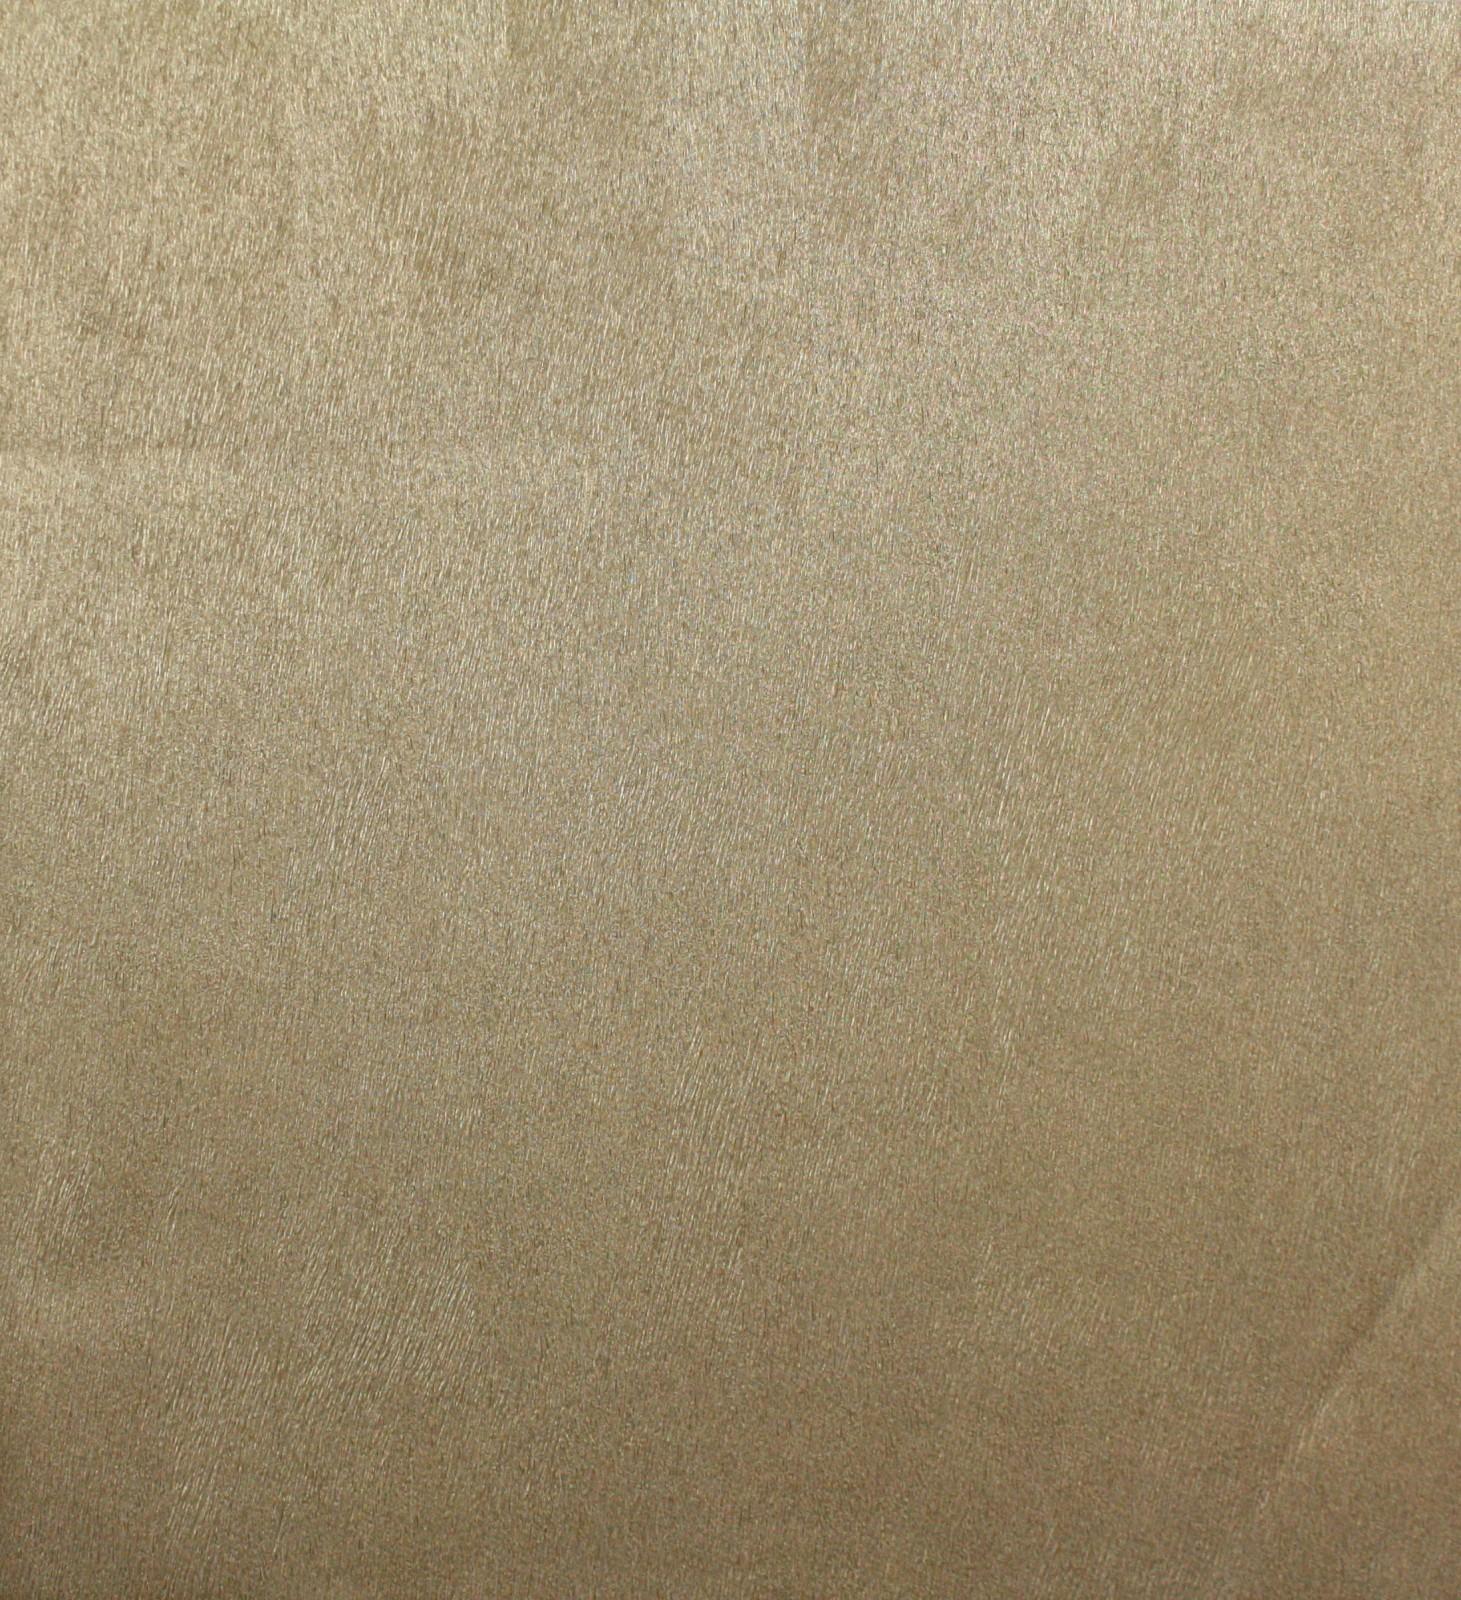 african queen vliestapete afrika tapete 422696 fell braun. Black Bedroom Furniture Sets. Home Design Ideas